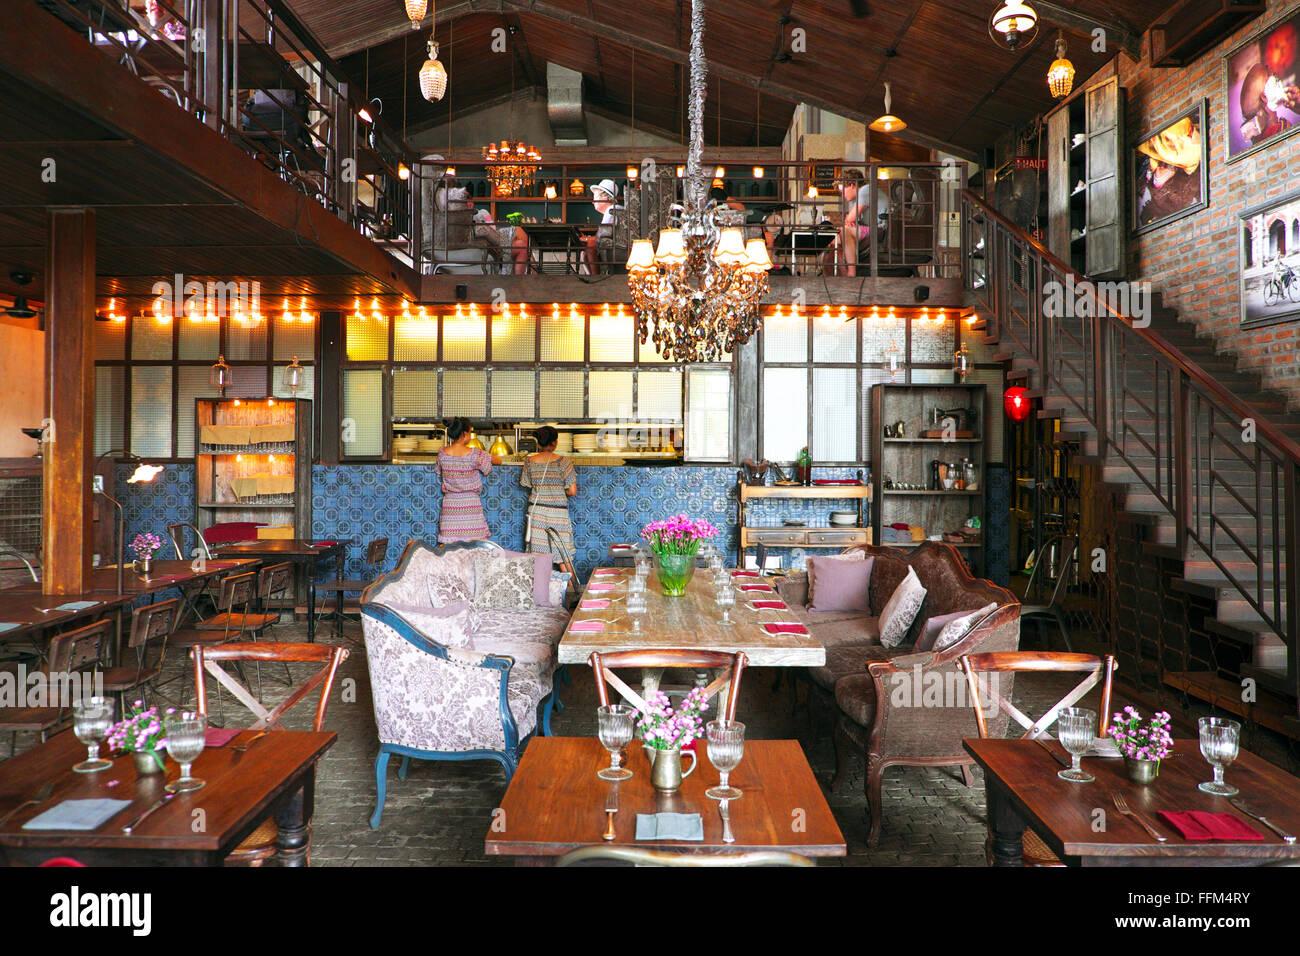 Interior of The Bistrot cafe/restaurant in Seminyak, Bali, Indonesia - Stock Image